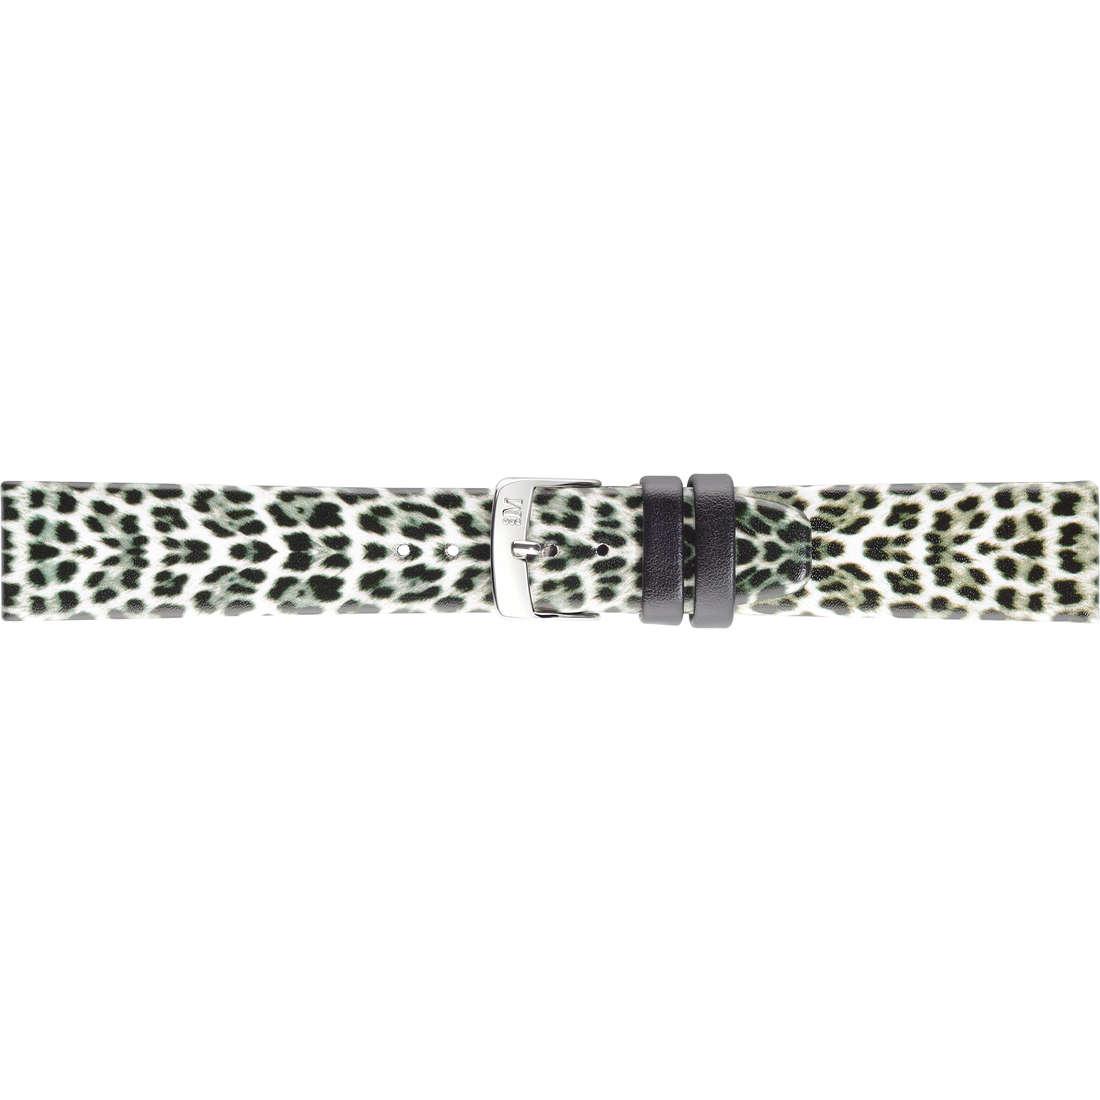 watch watch bands watch straps woman Morellato Morellato 1930 A01D3642934804CR18